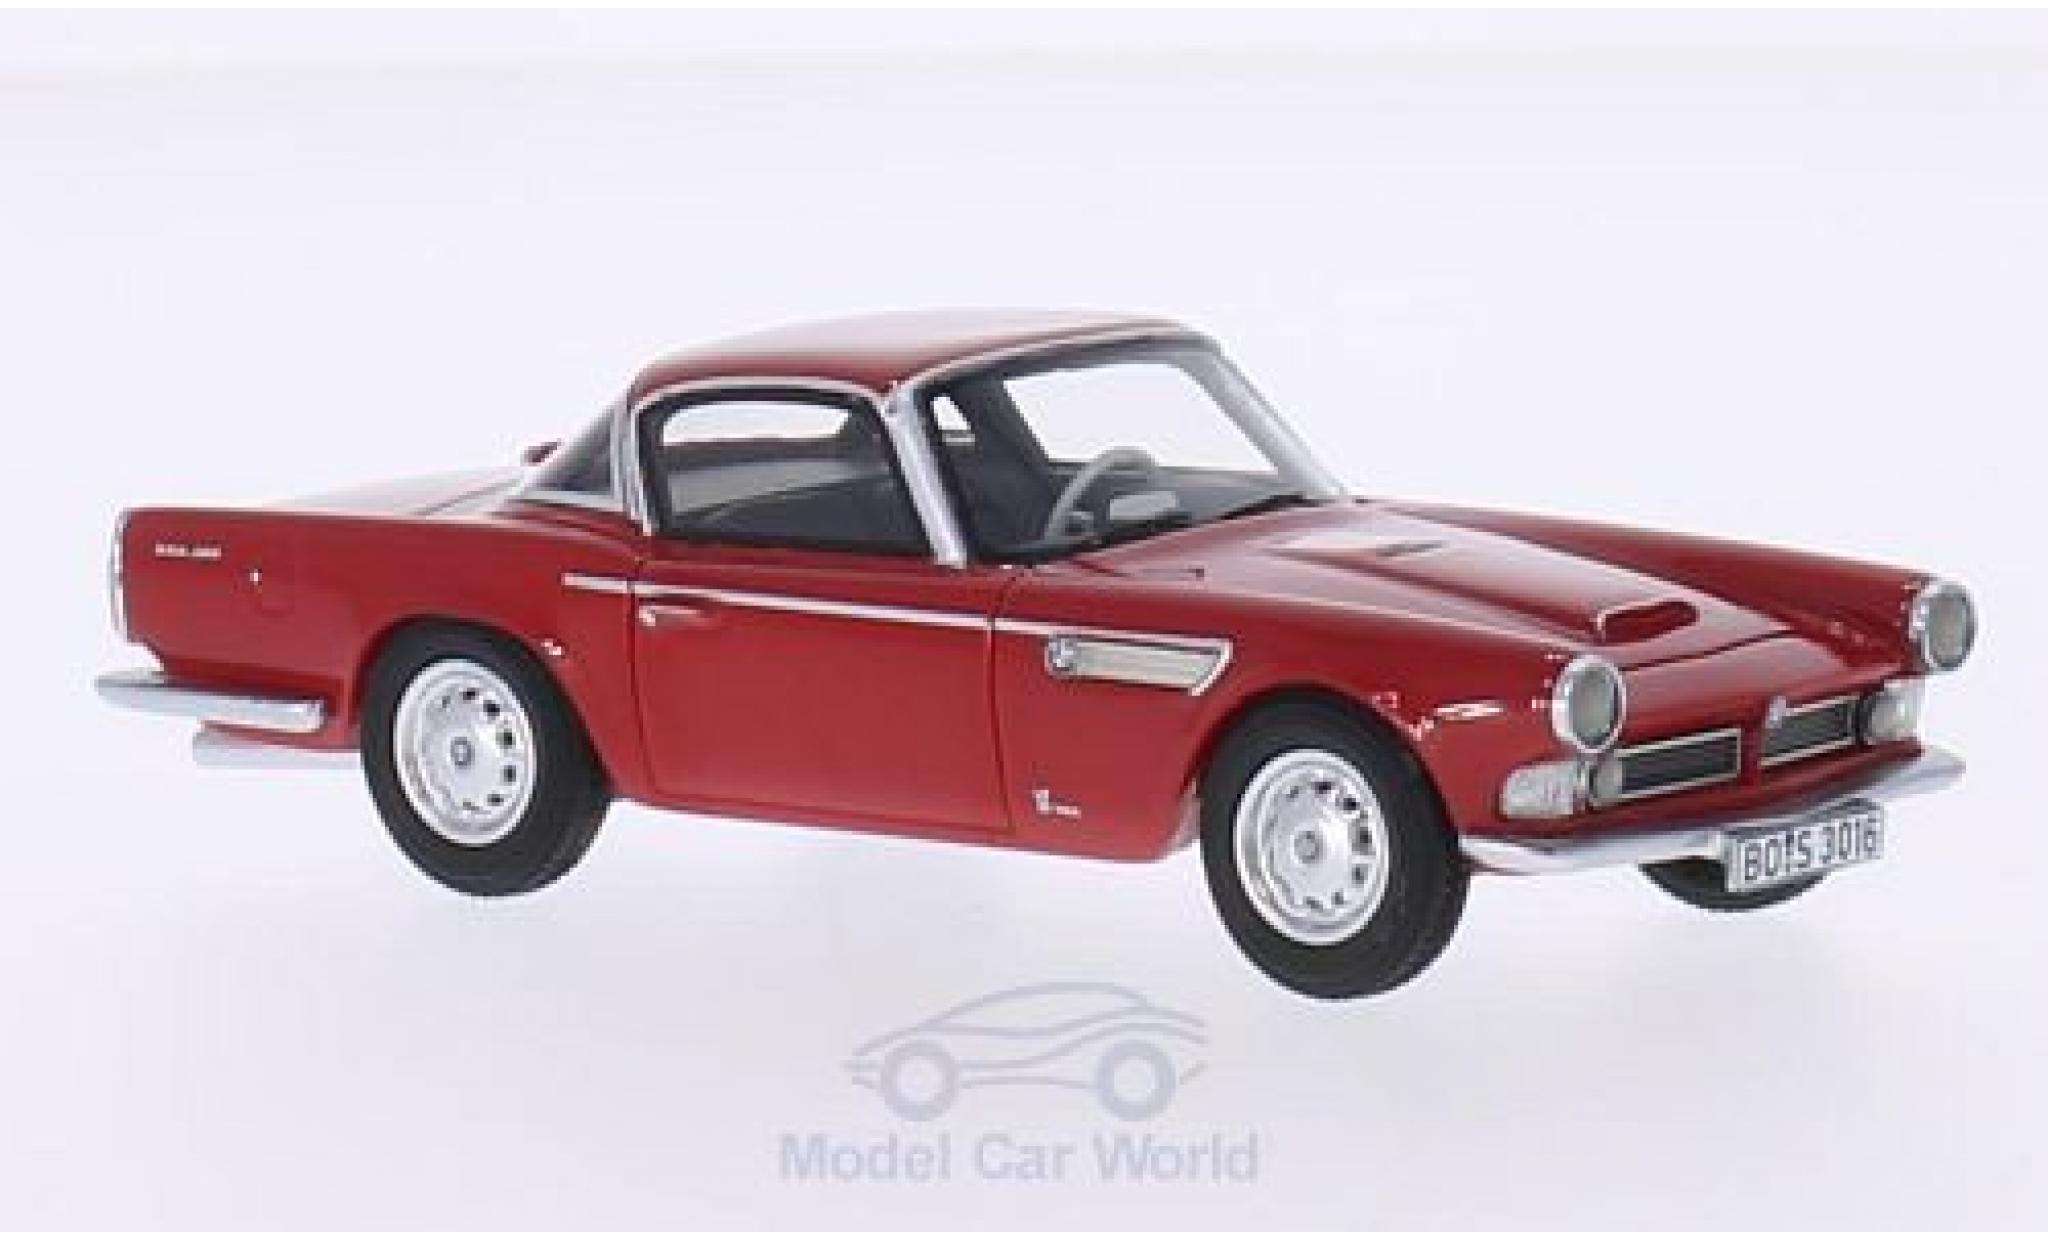 Bmw 3200 1/43 BoS Models BMW Michelotti Vignale red 1959